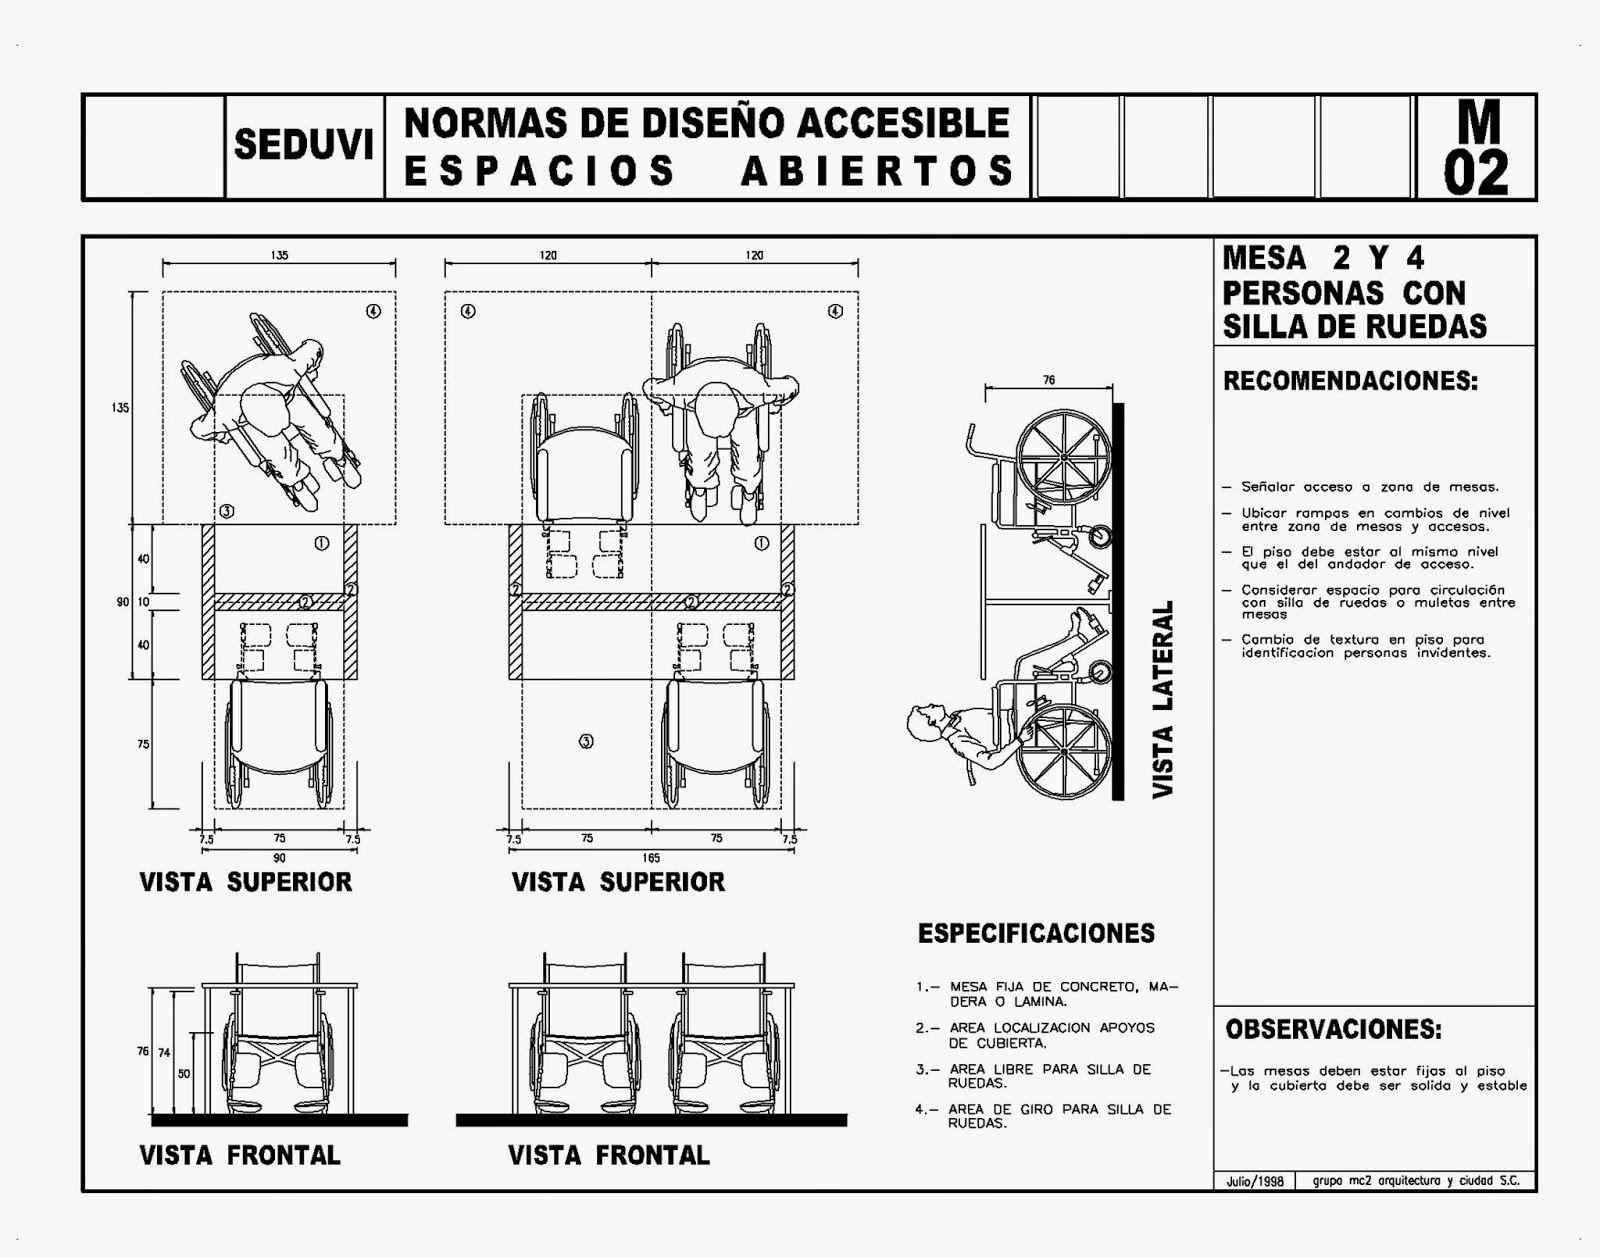 Diseno de ba o para discapacitados todo para el arqui for Medidas bano discapacitados